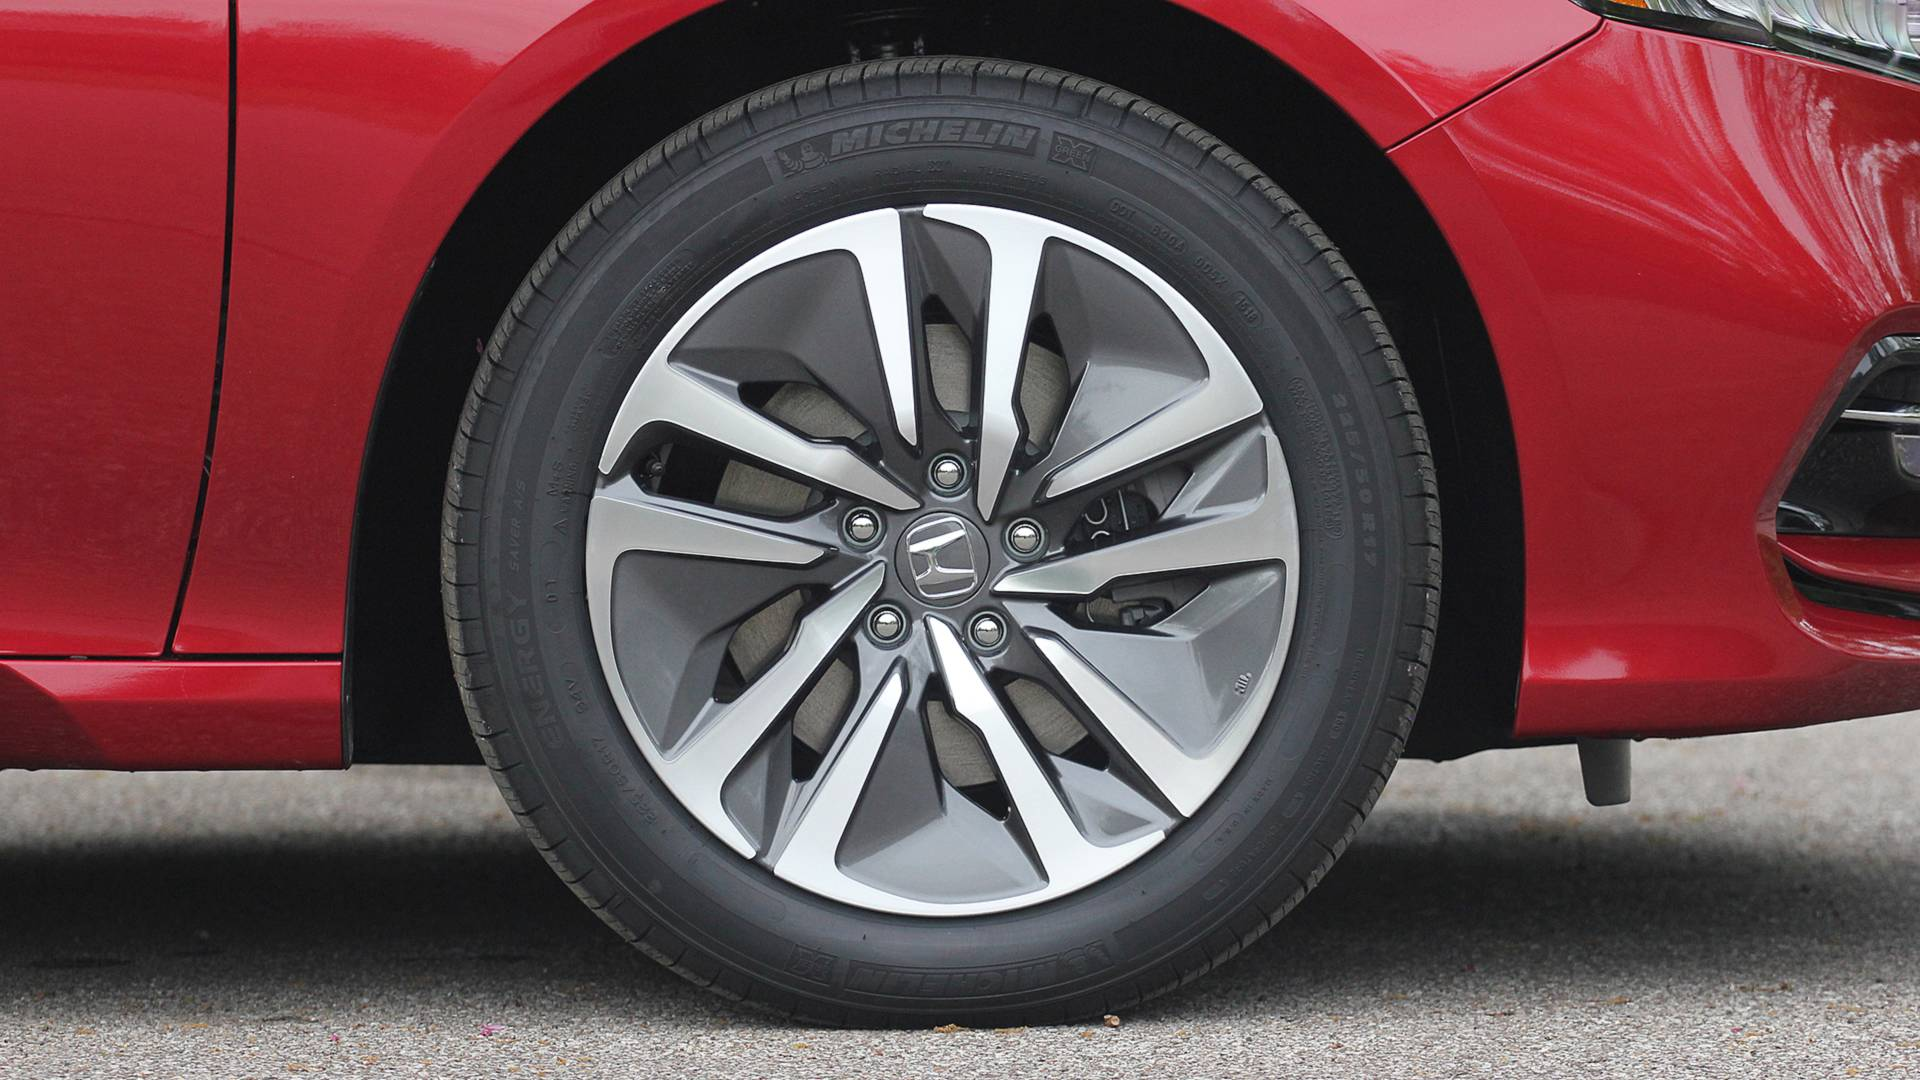 2018-honda-accord-hybrid-danh-gia-17.jpg